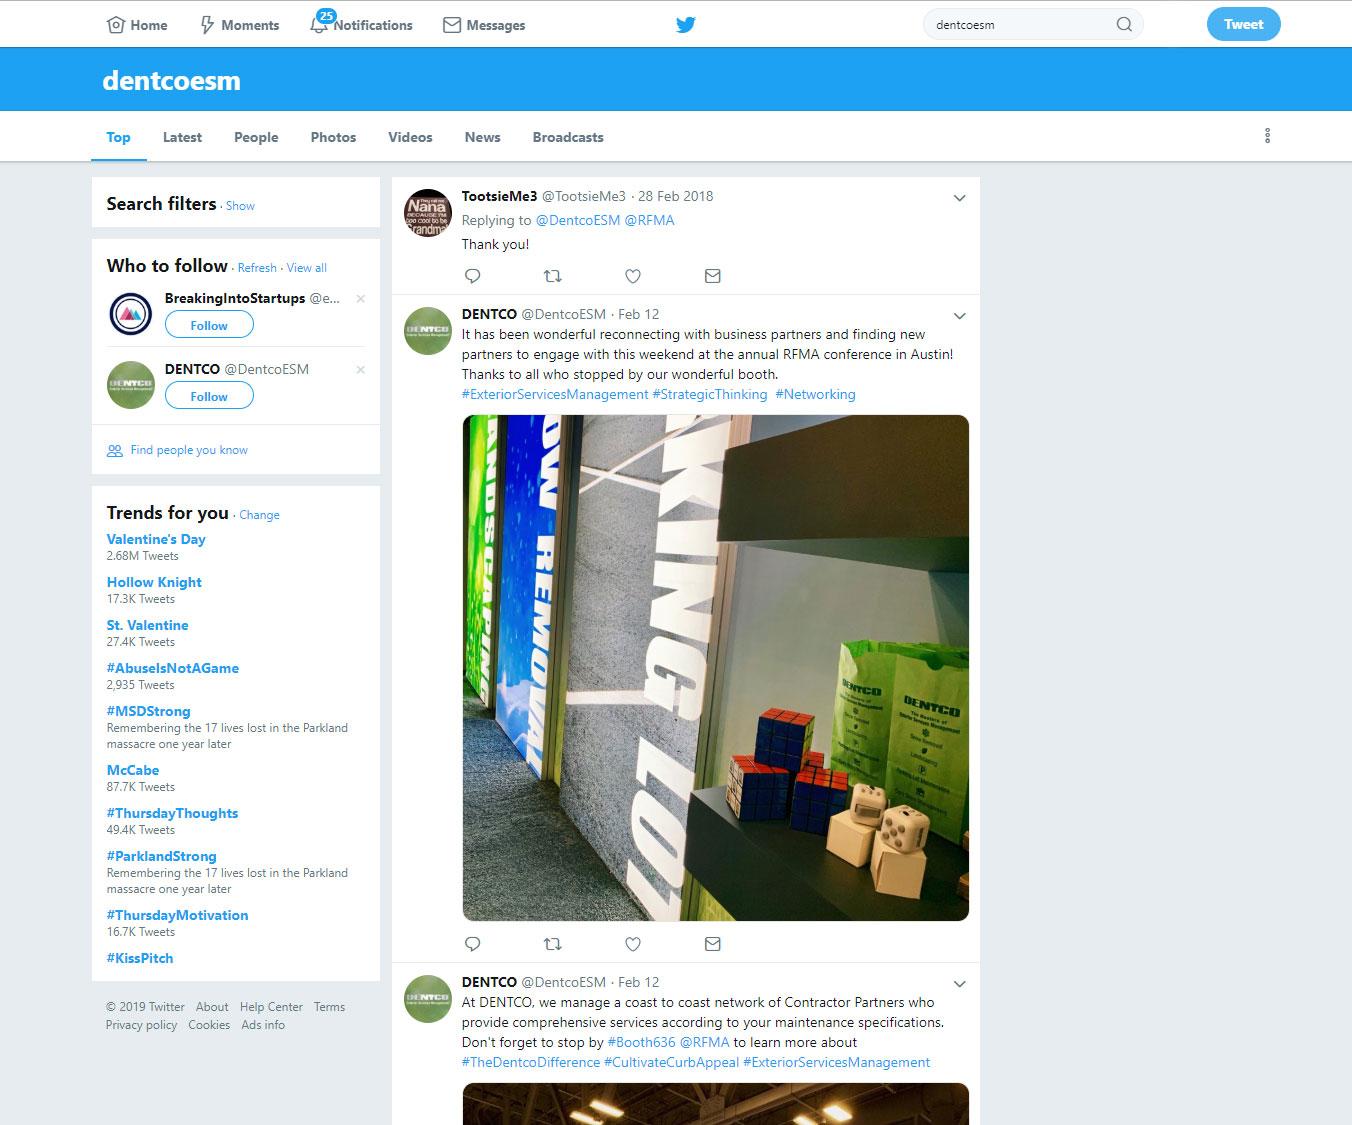 Dentco-Twitter-2019